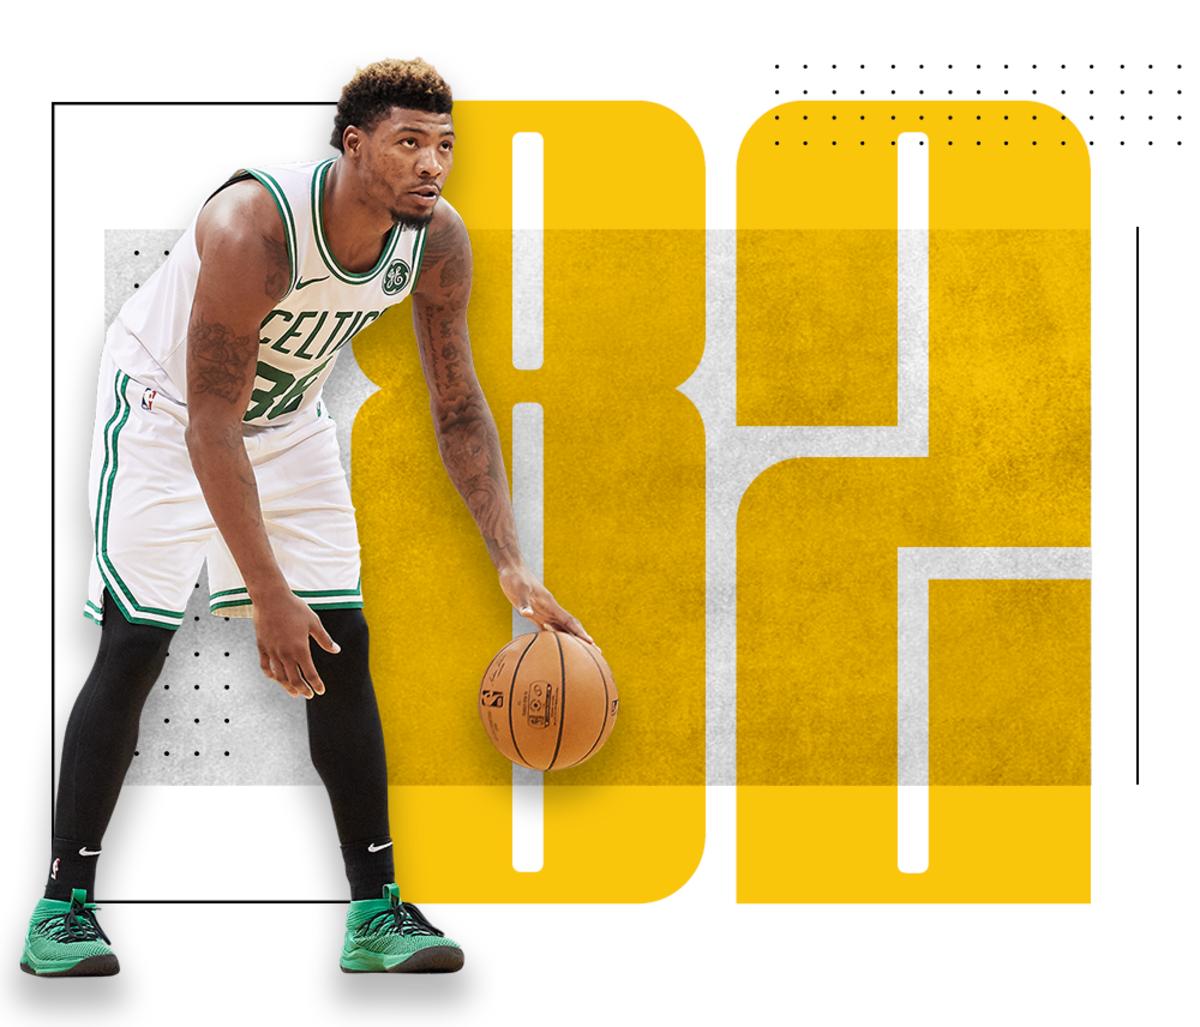 top-100-nba-players-2020-Marcus-Smart.png